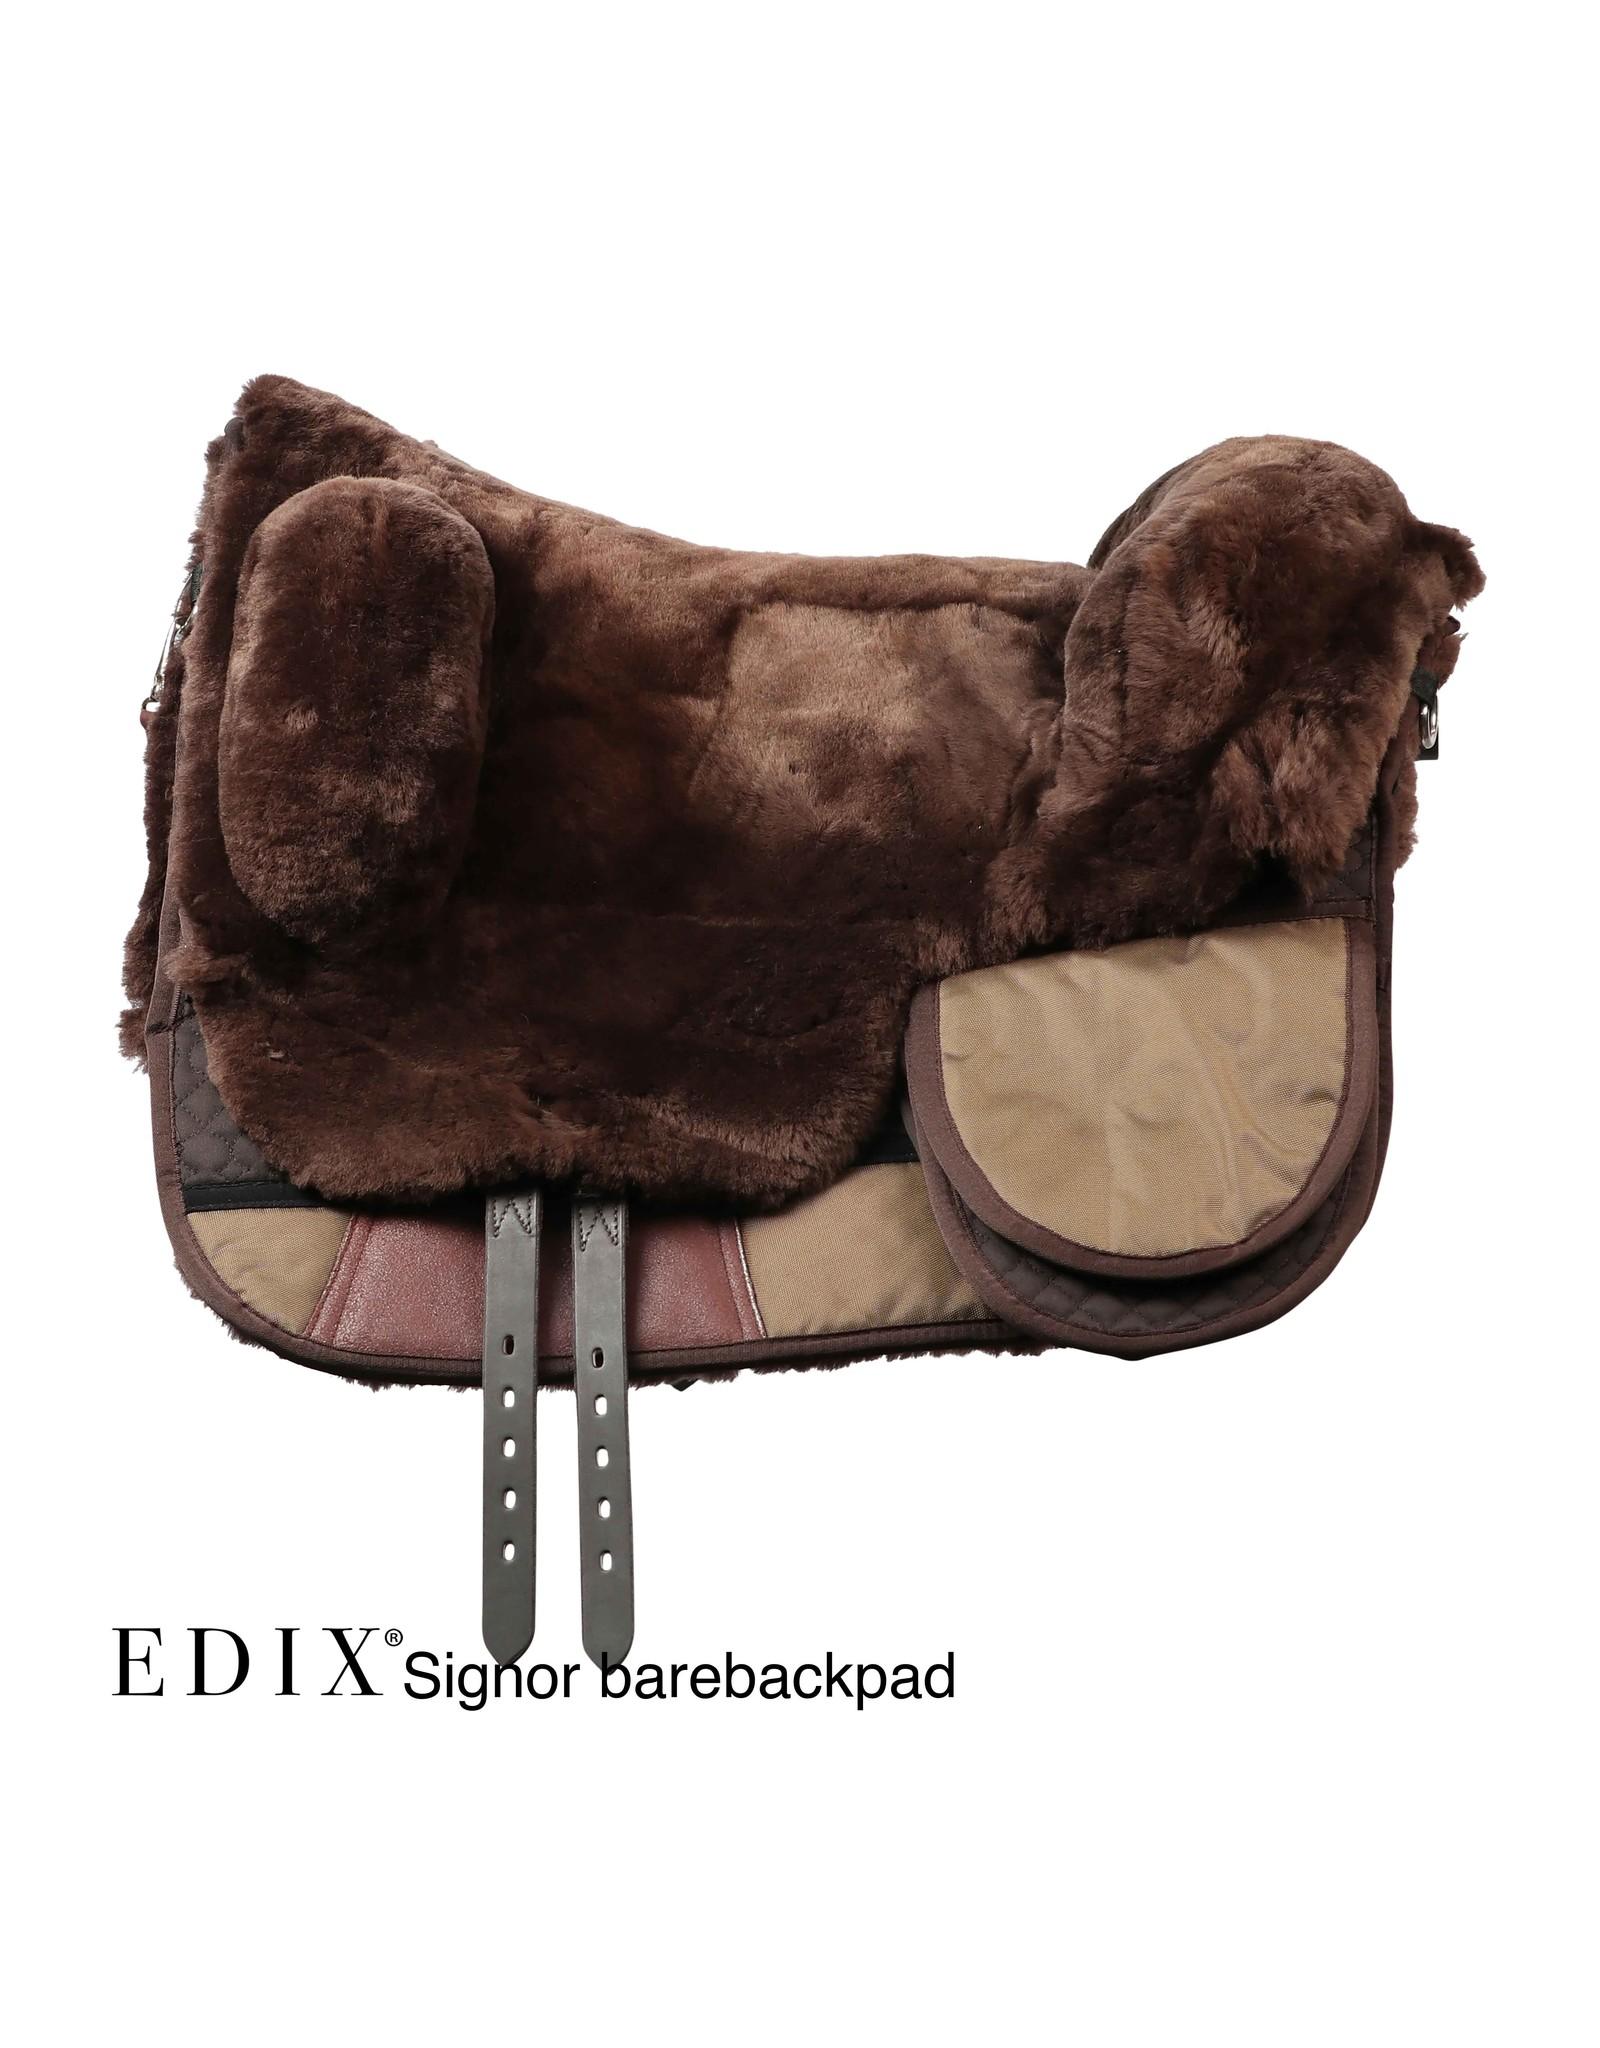 EDIX  Bareback-Pad Signor anatomisch